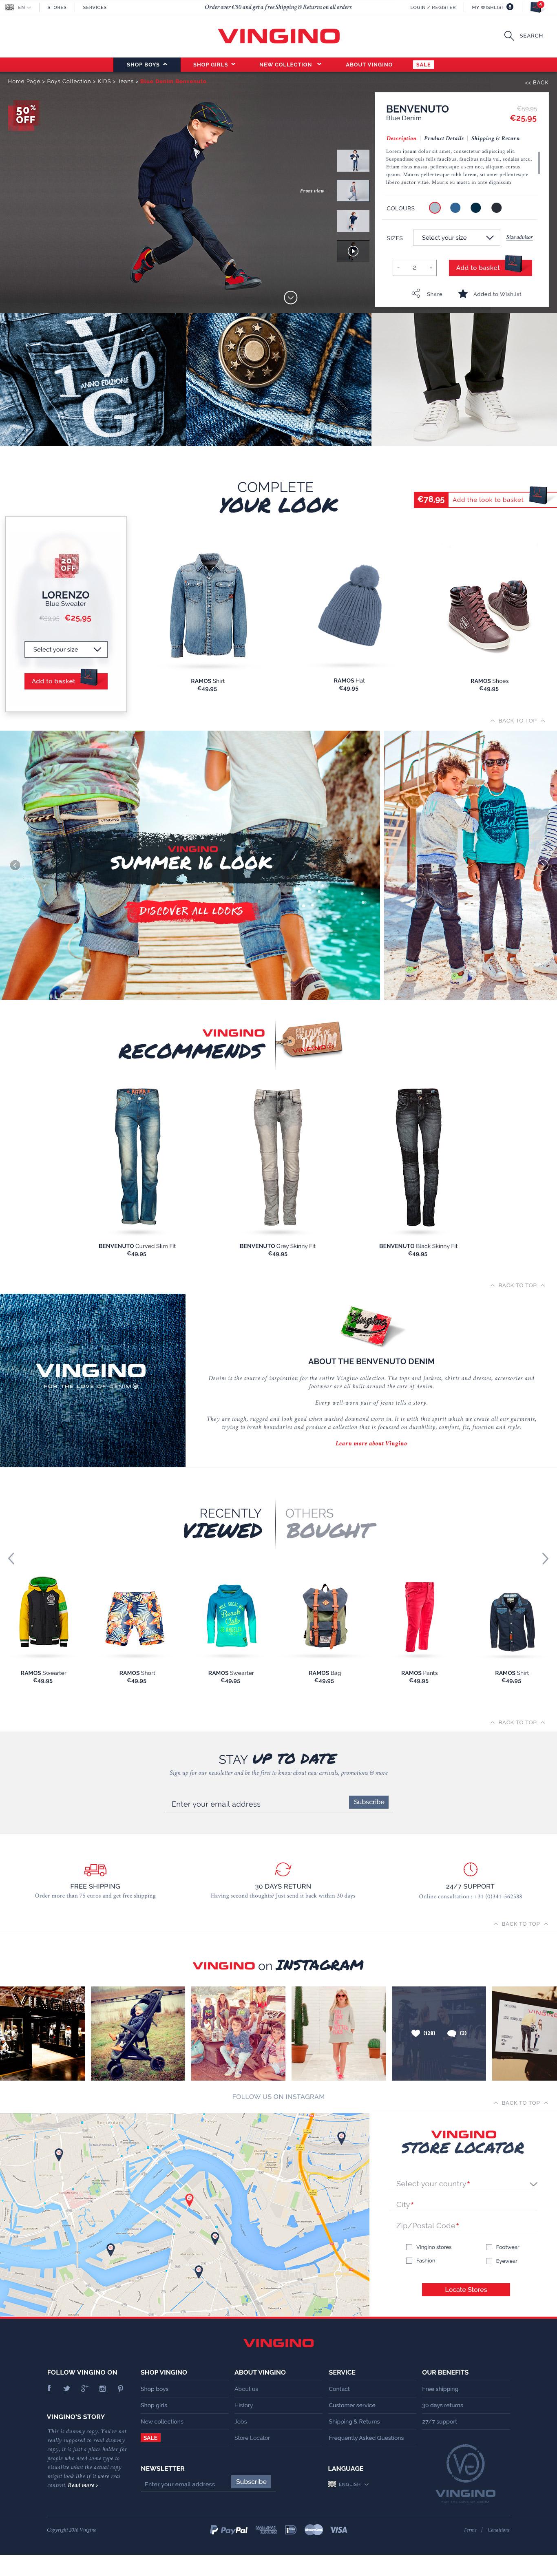 04-_-Product-Page---Boys---Vingino---Desktop.jpg